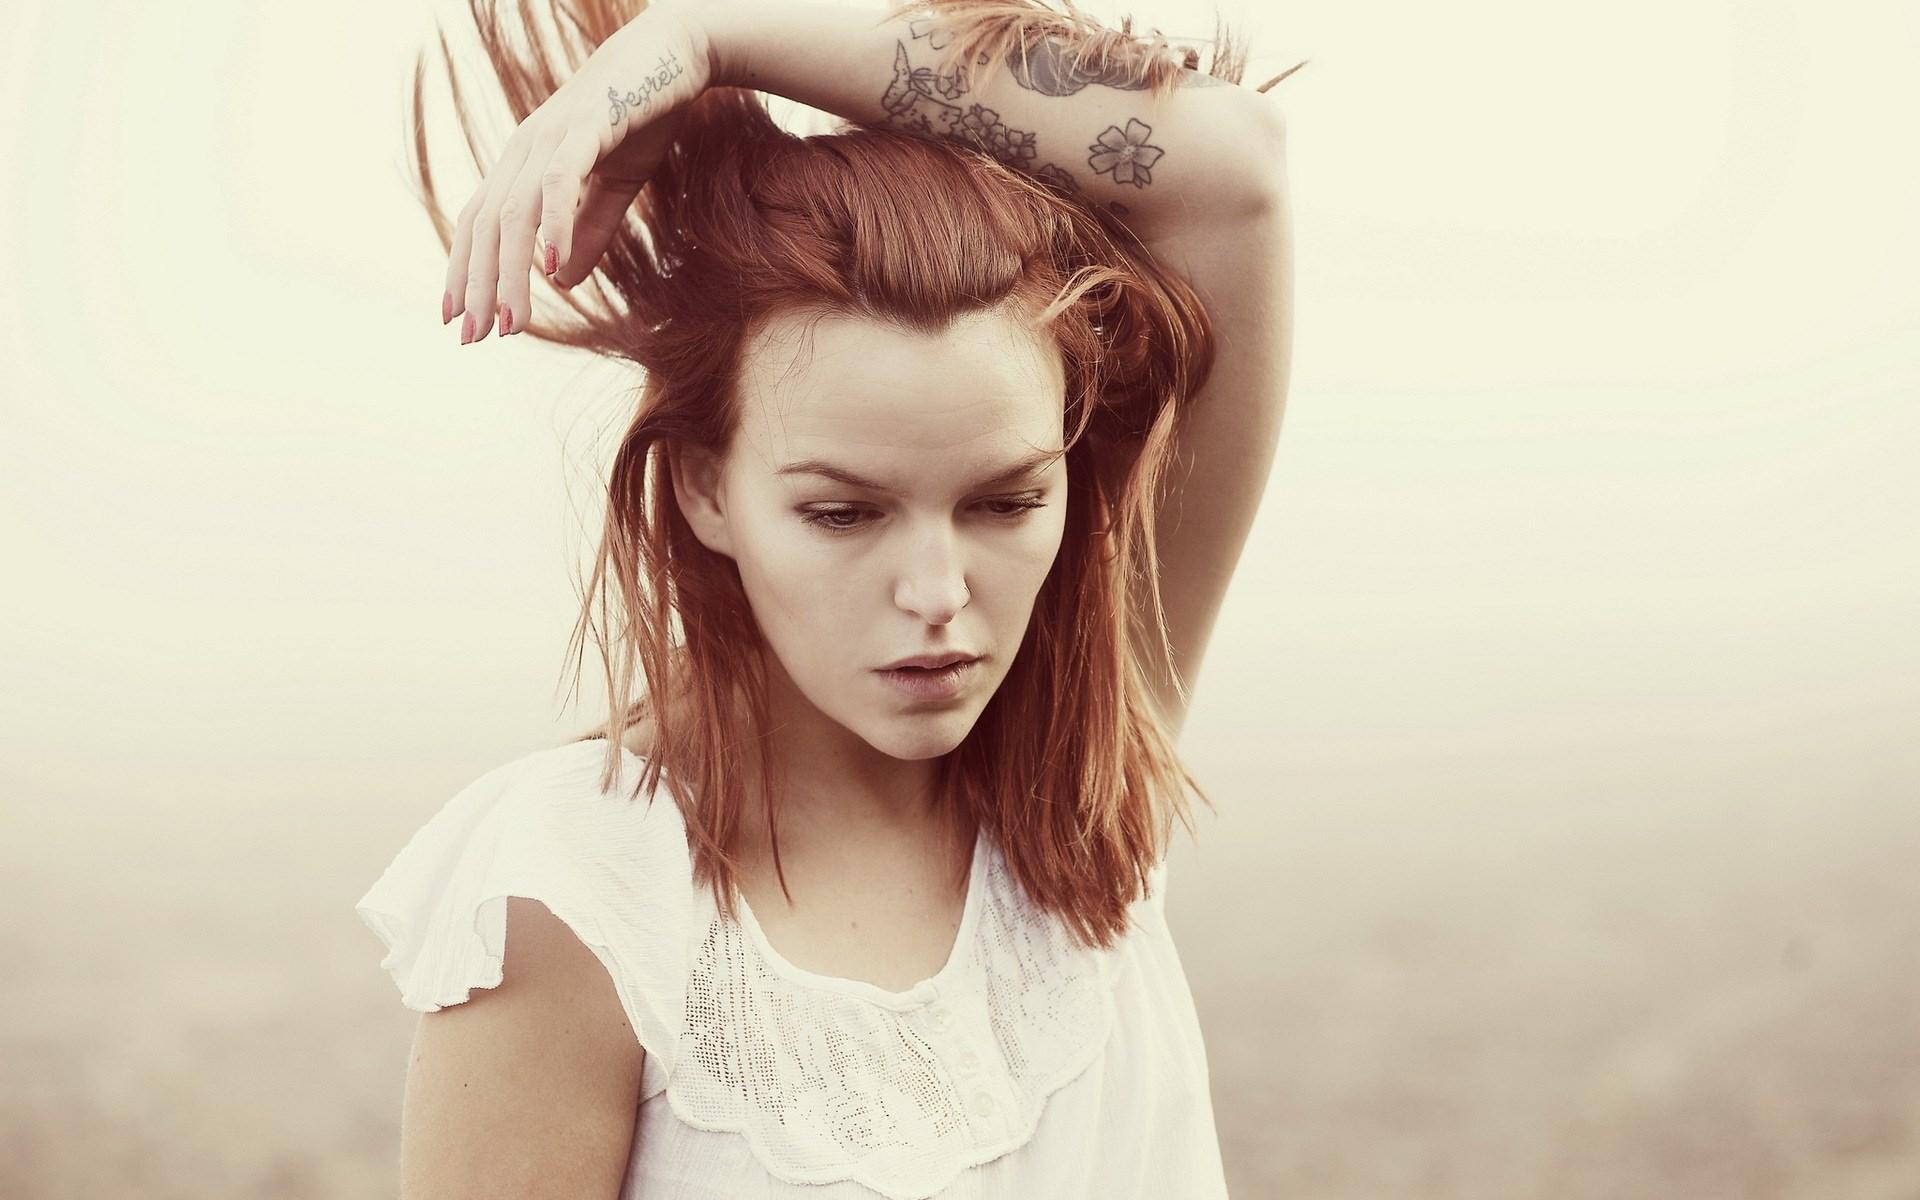 Girl Tattoos Mood